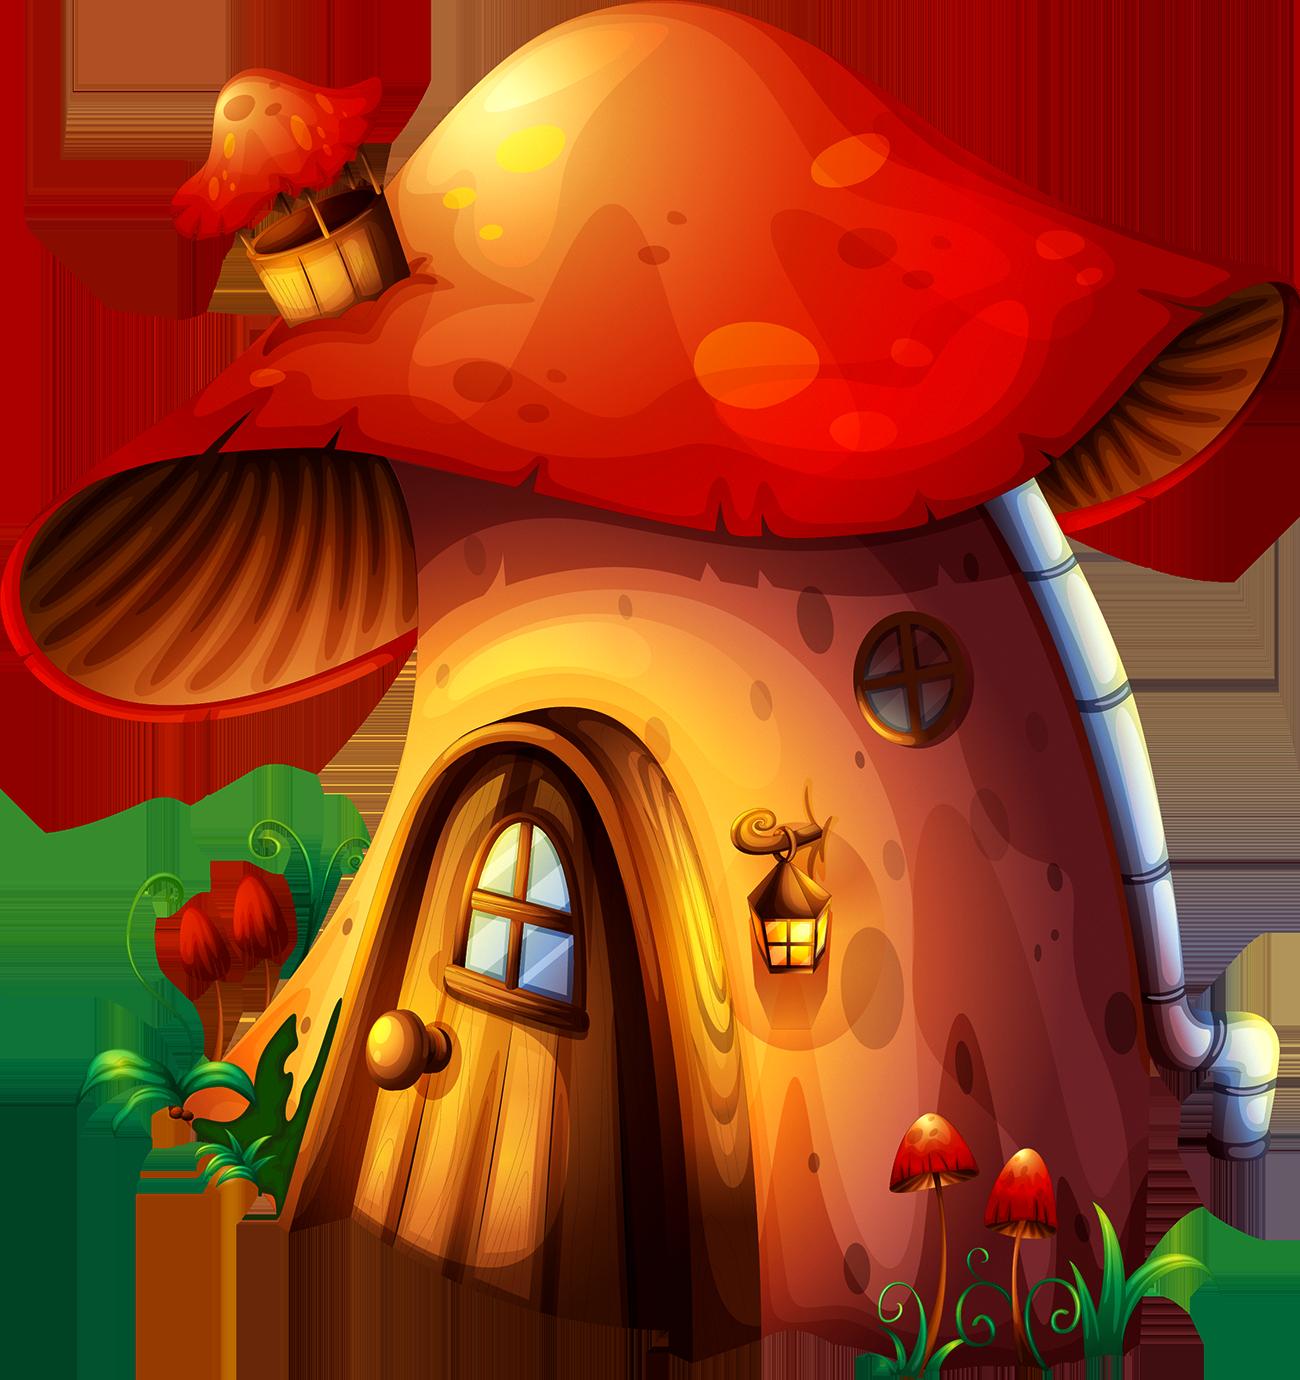 Mushroom clipart mushroom home. House stock photography clip